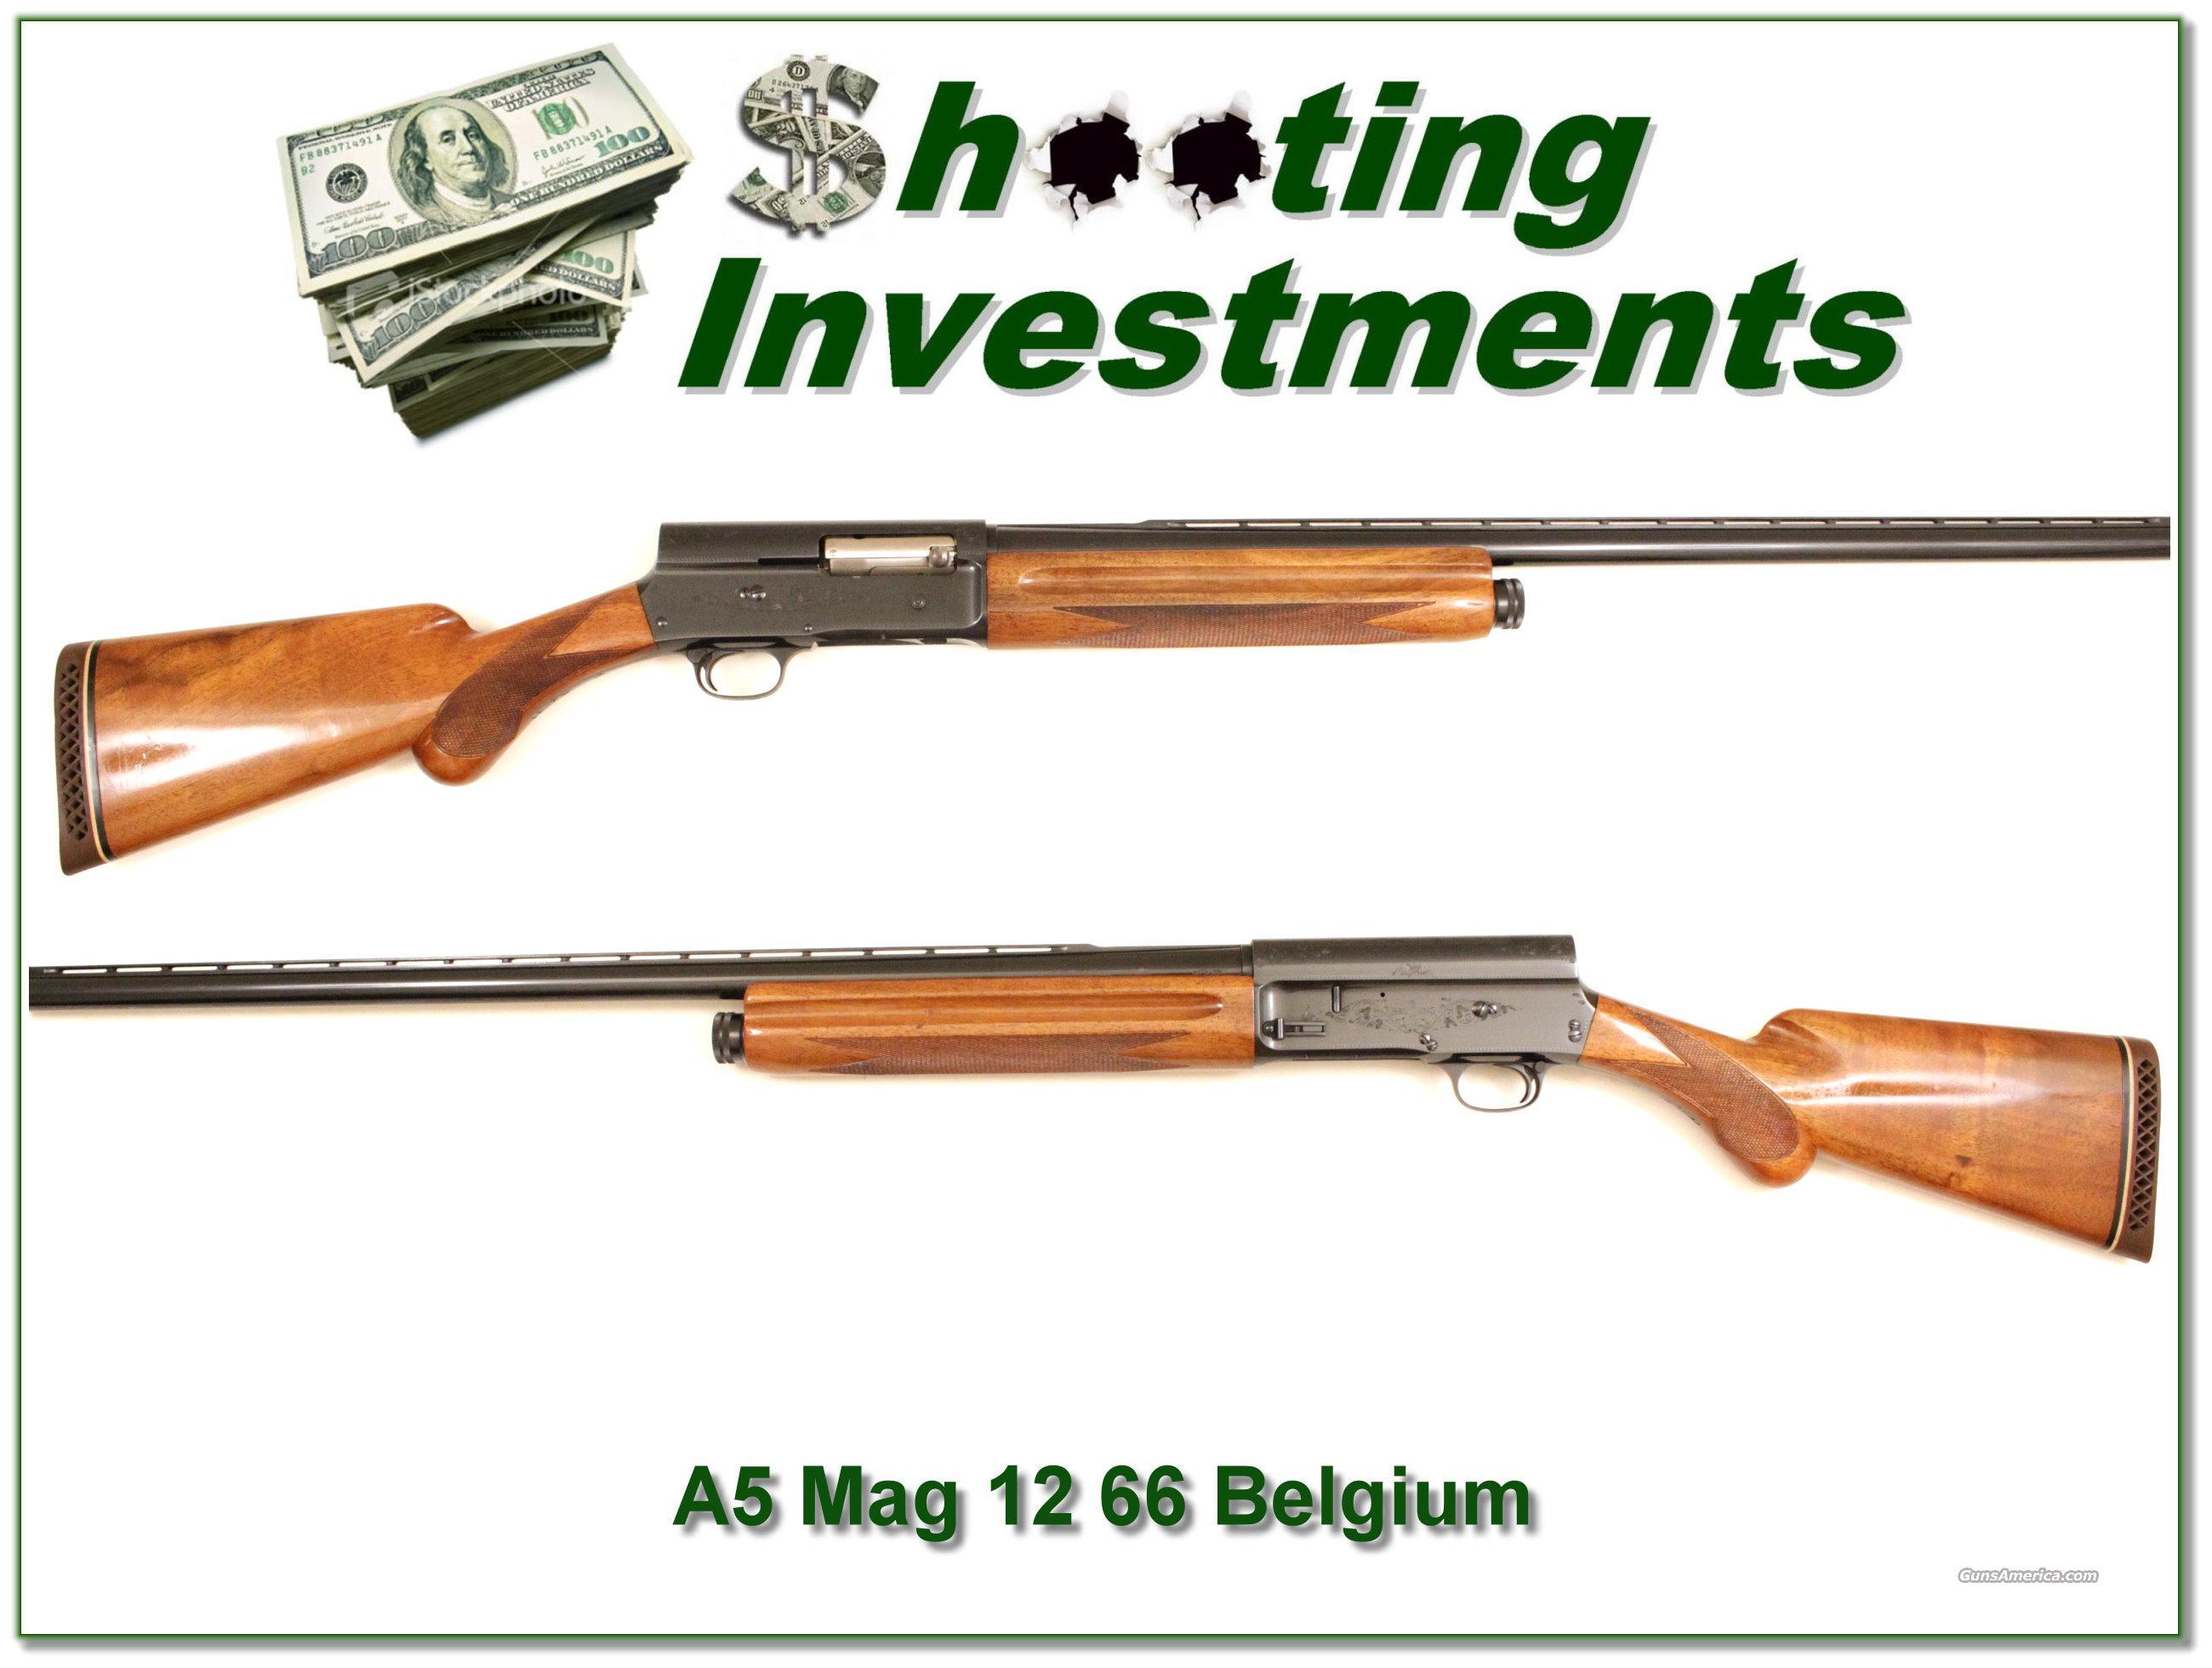 Browning A5 Magnum 12 '66 Belgium Blond  Guns > Shotguns > Browning Shotguns > Autoloaders > Hunting